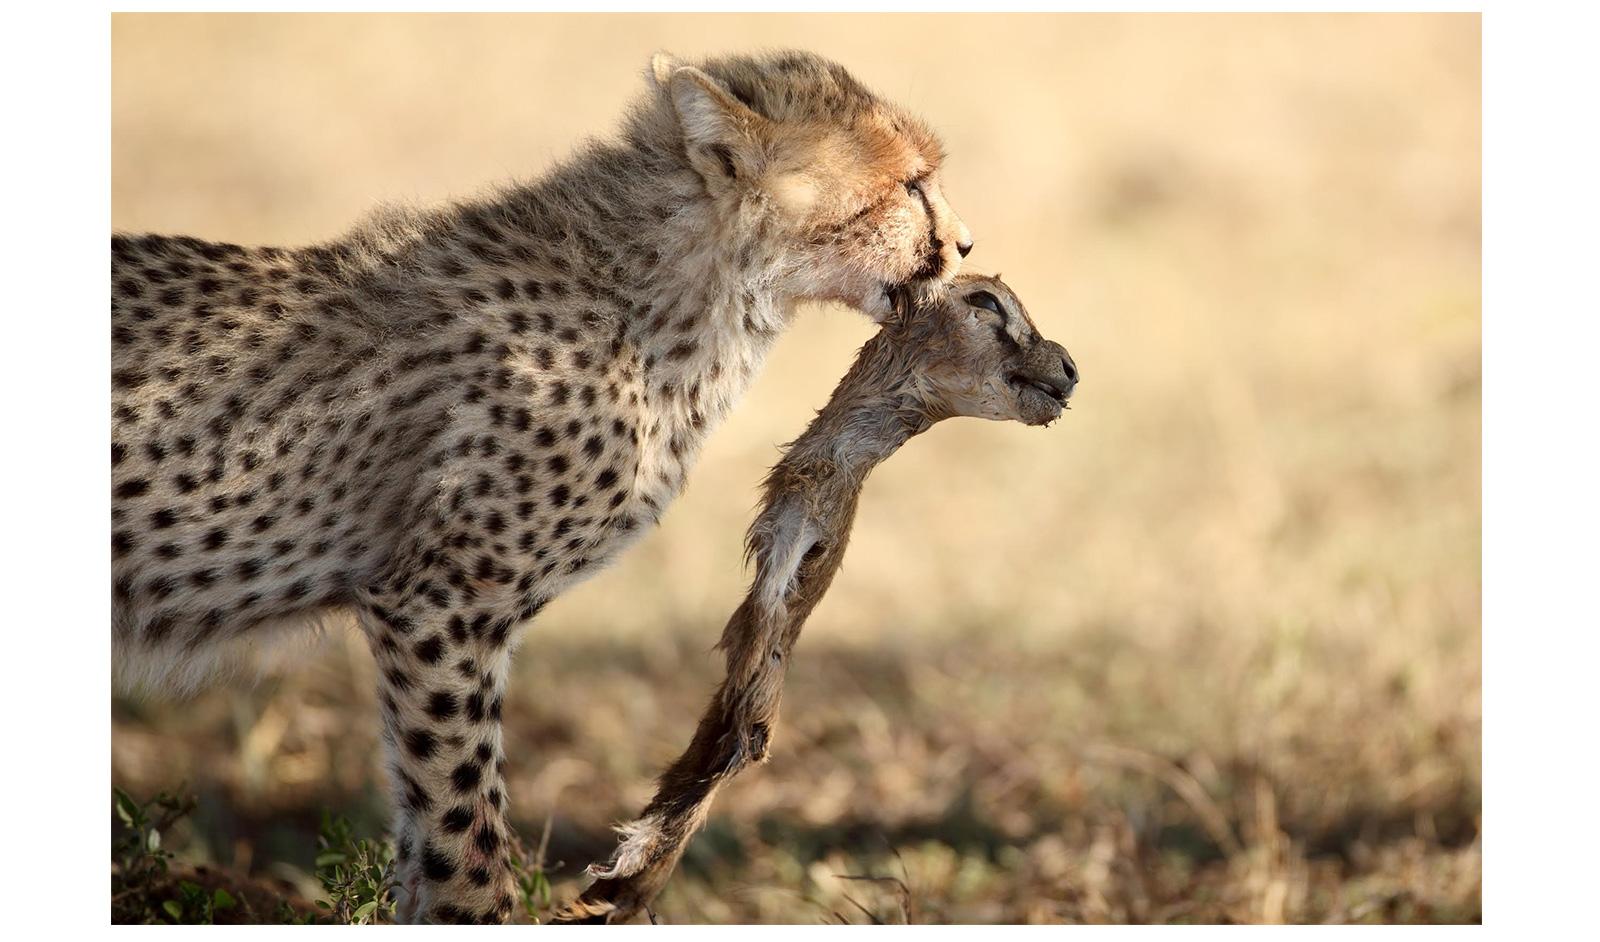 Burak-Dogansoysal-cheetah-cub-and-gazelle-maasai-mara